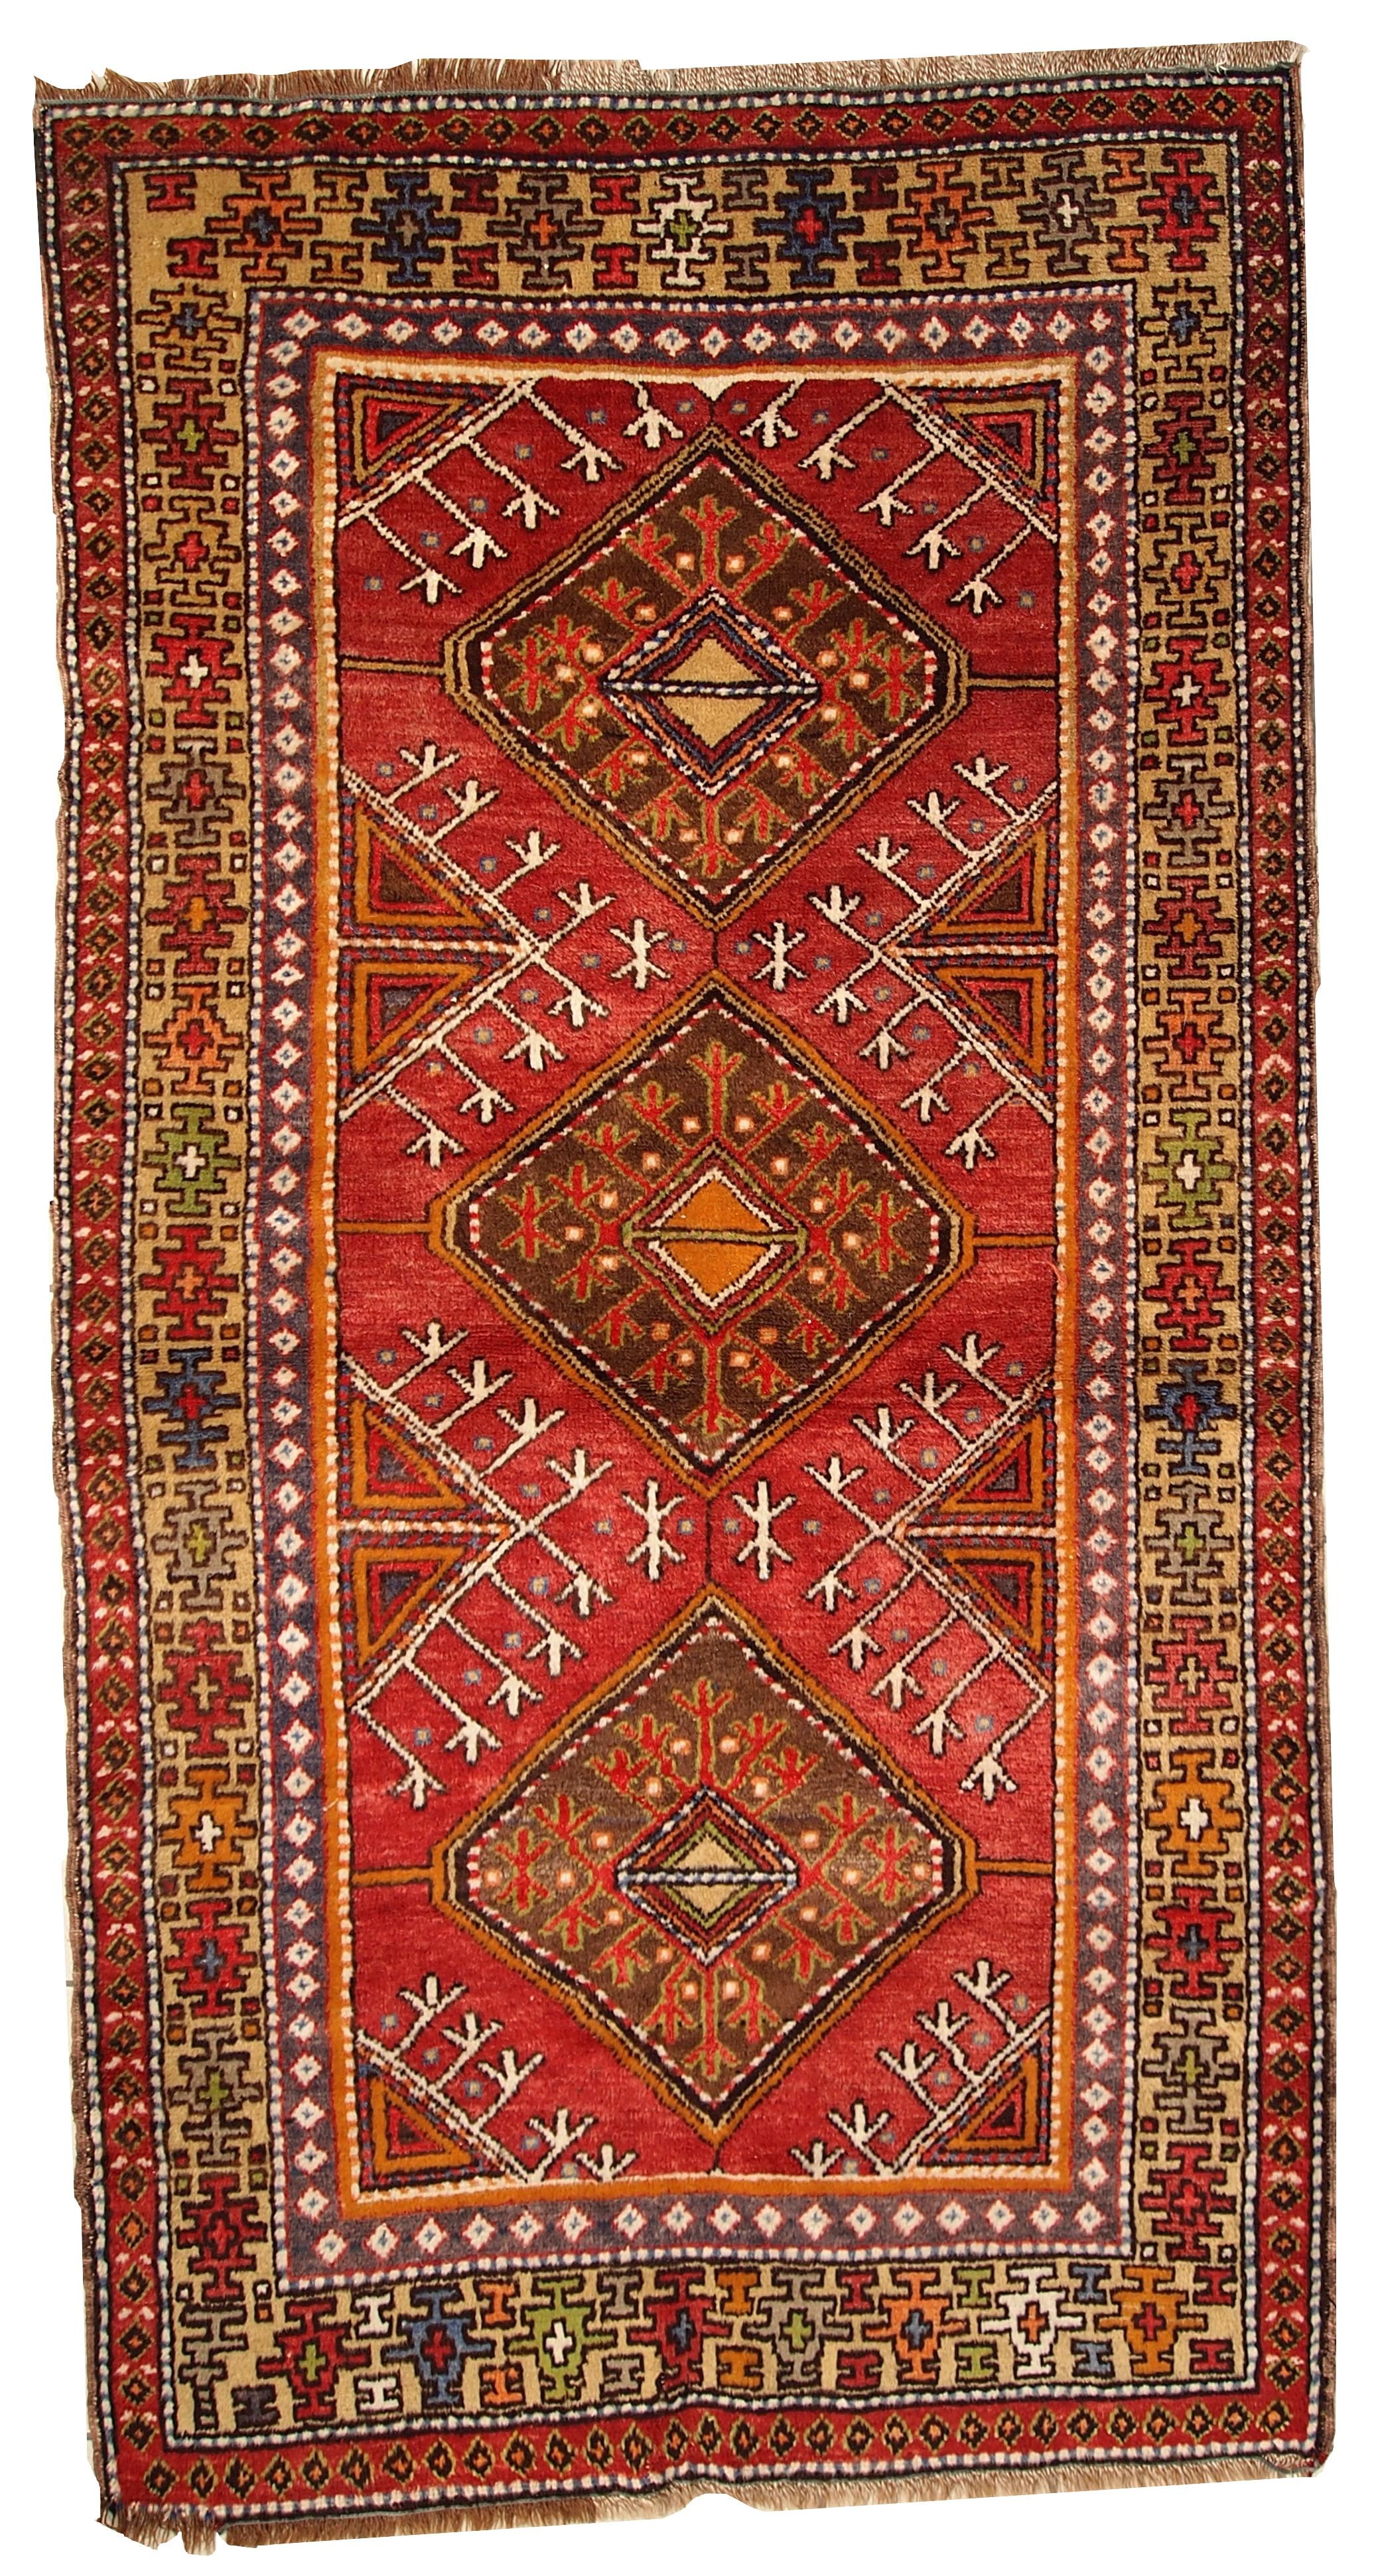 Handmade Antique Turkish Anatolian Rug